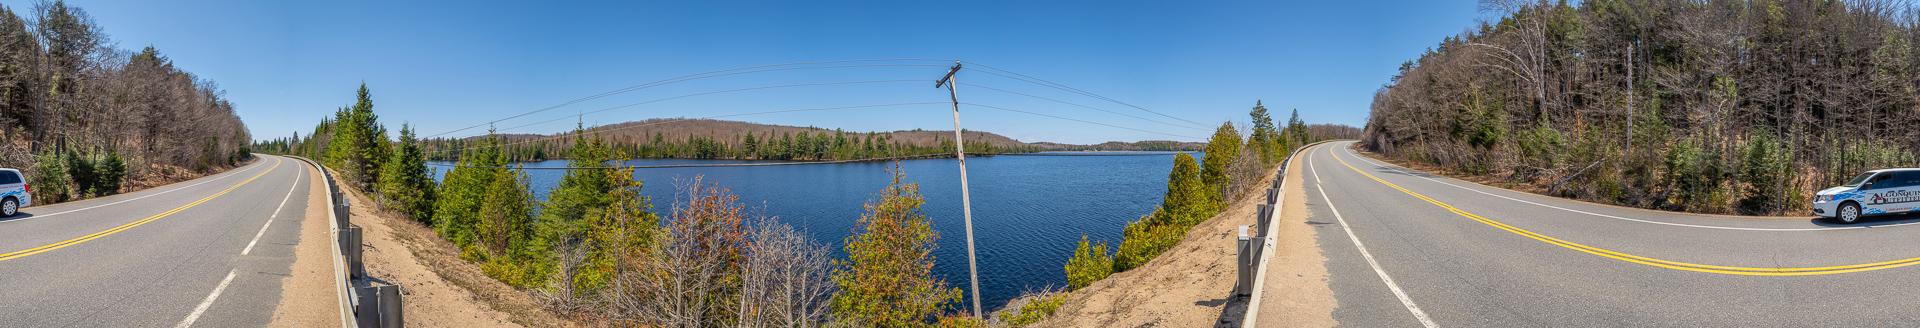 Tea Lake